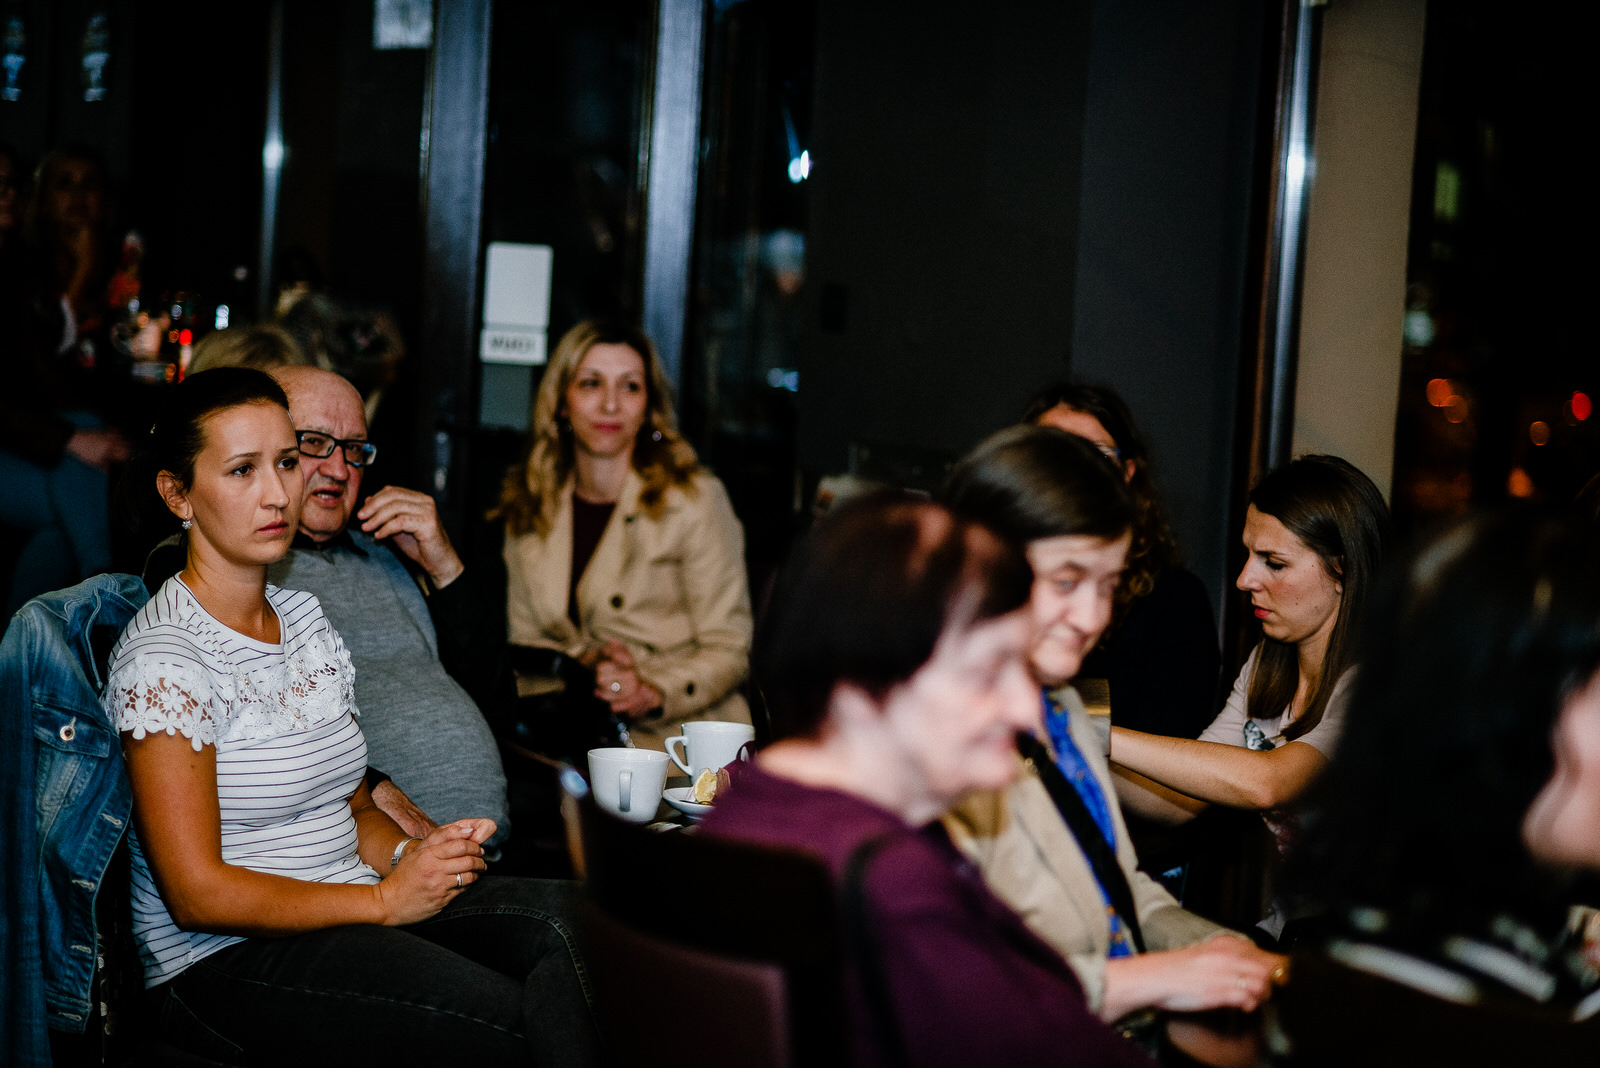 likaclub_otočac_book-caffe-paradisso_kenan-crnkić_2019-9